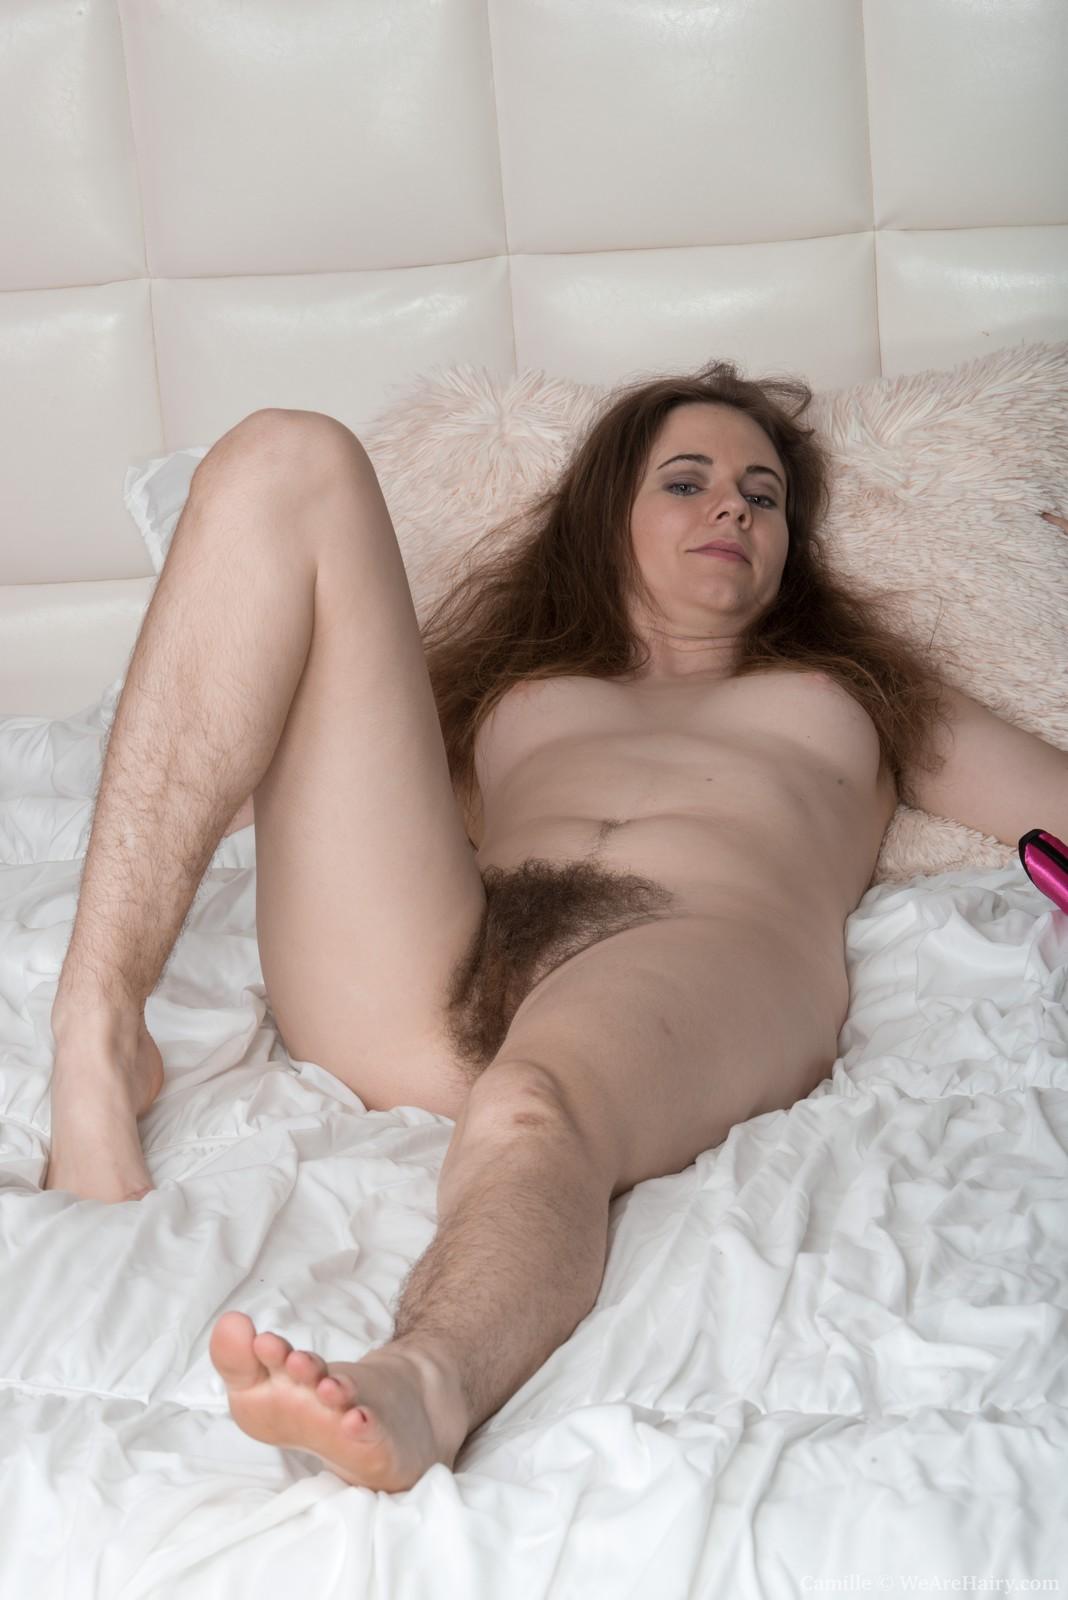 Teen hairy nude women fucking